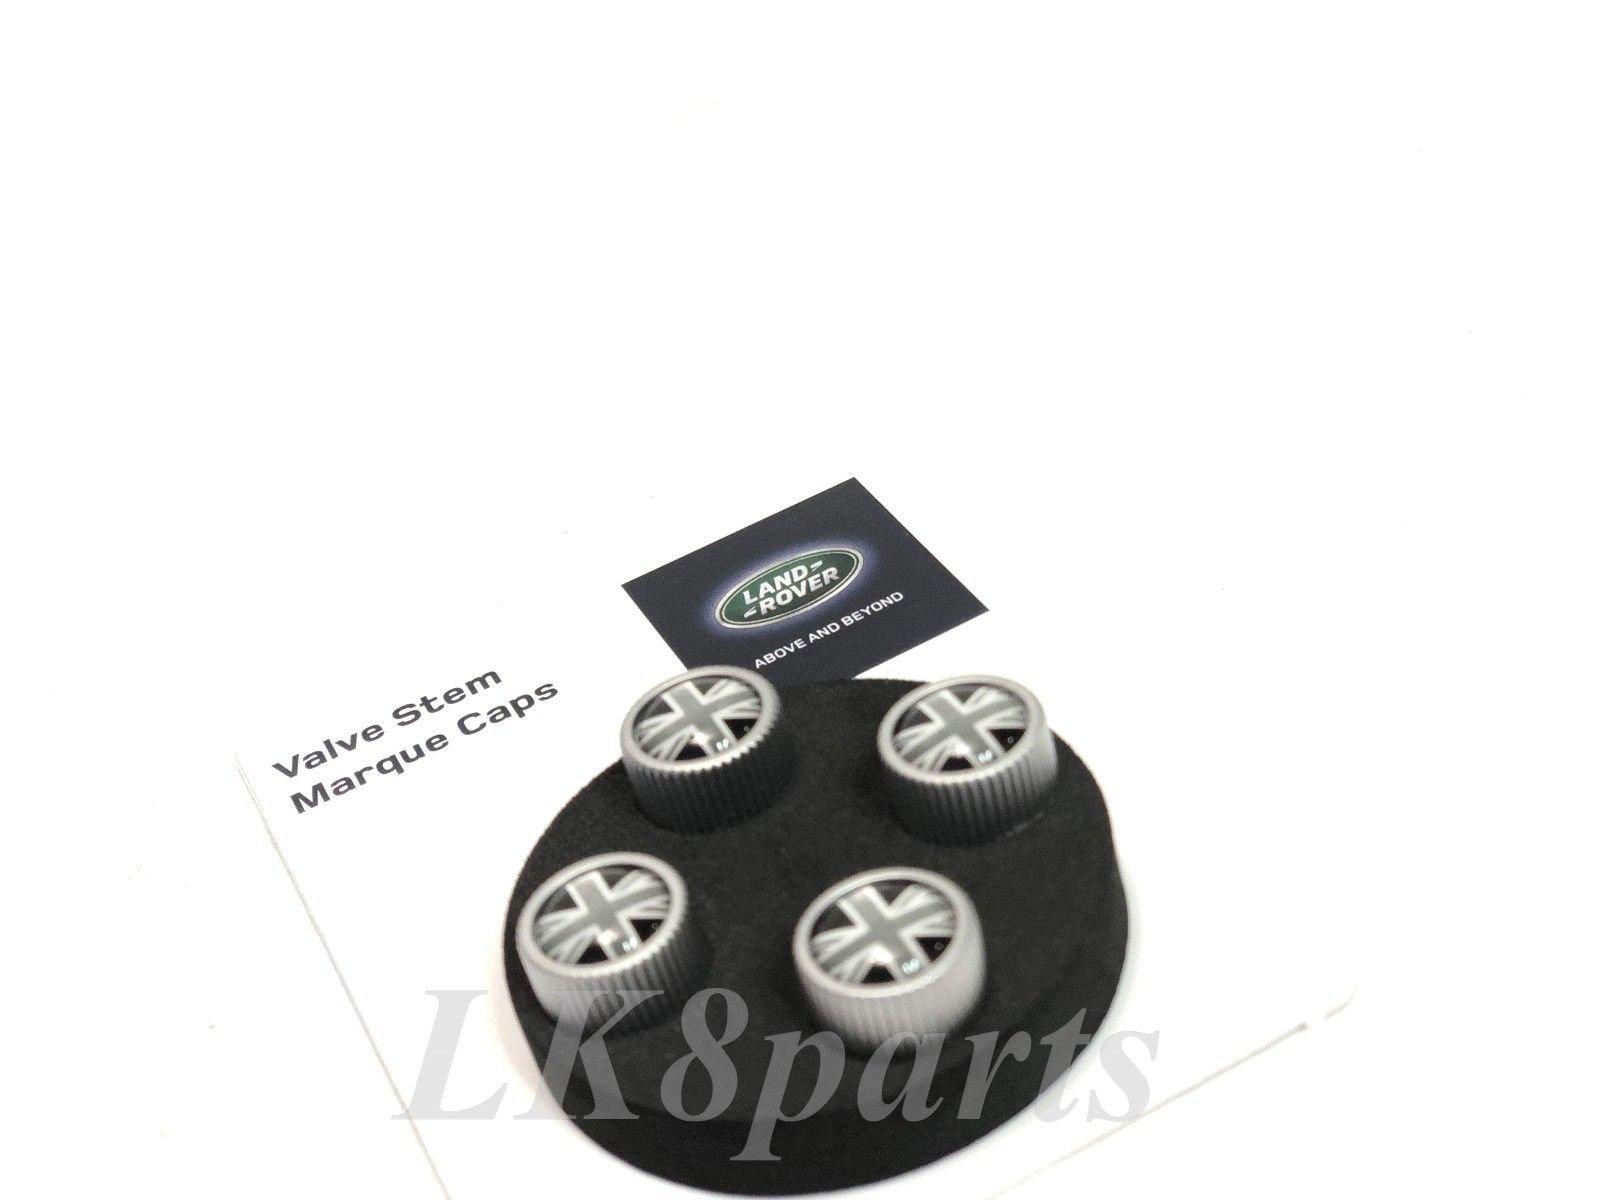 Land Rover Silver and Black Genuine Union Jack Tire Wheel Valve Stem Caps Set by Proper Spec